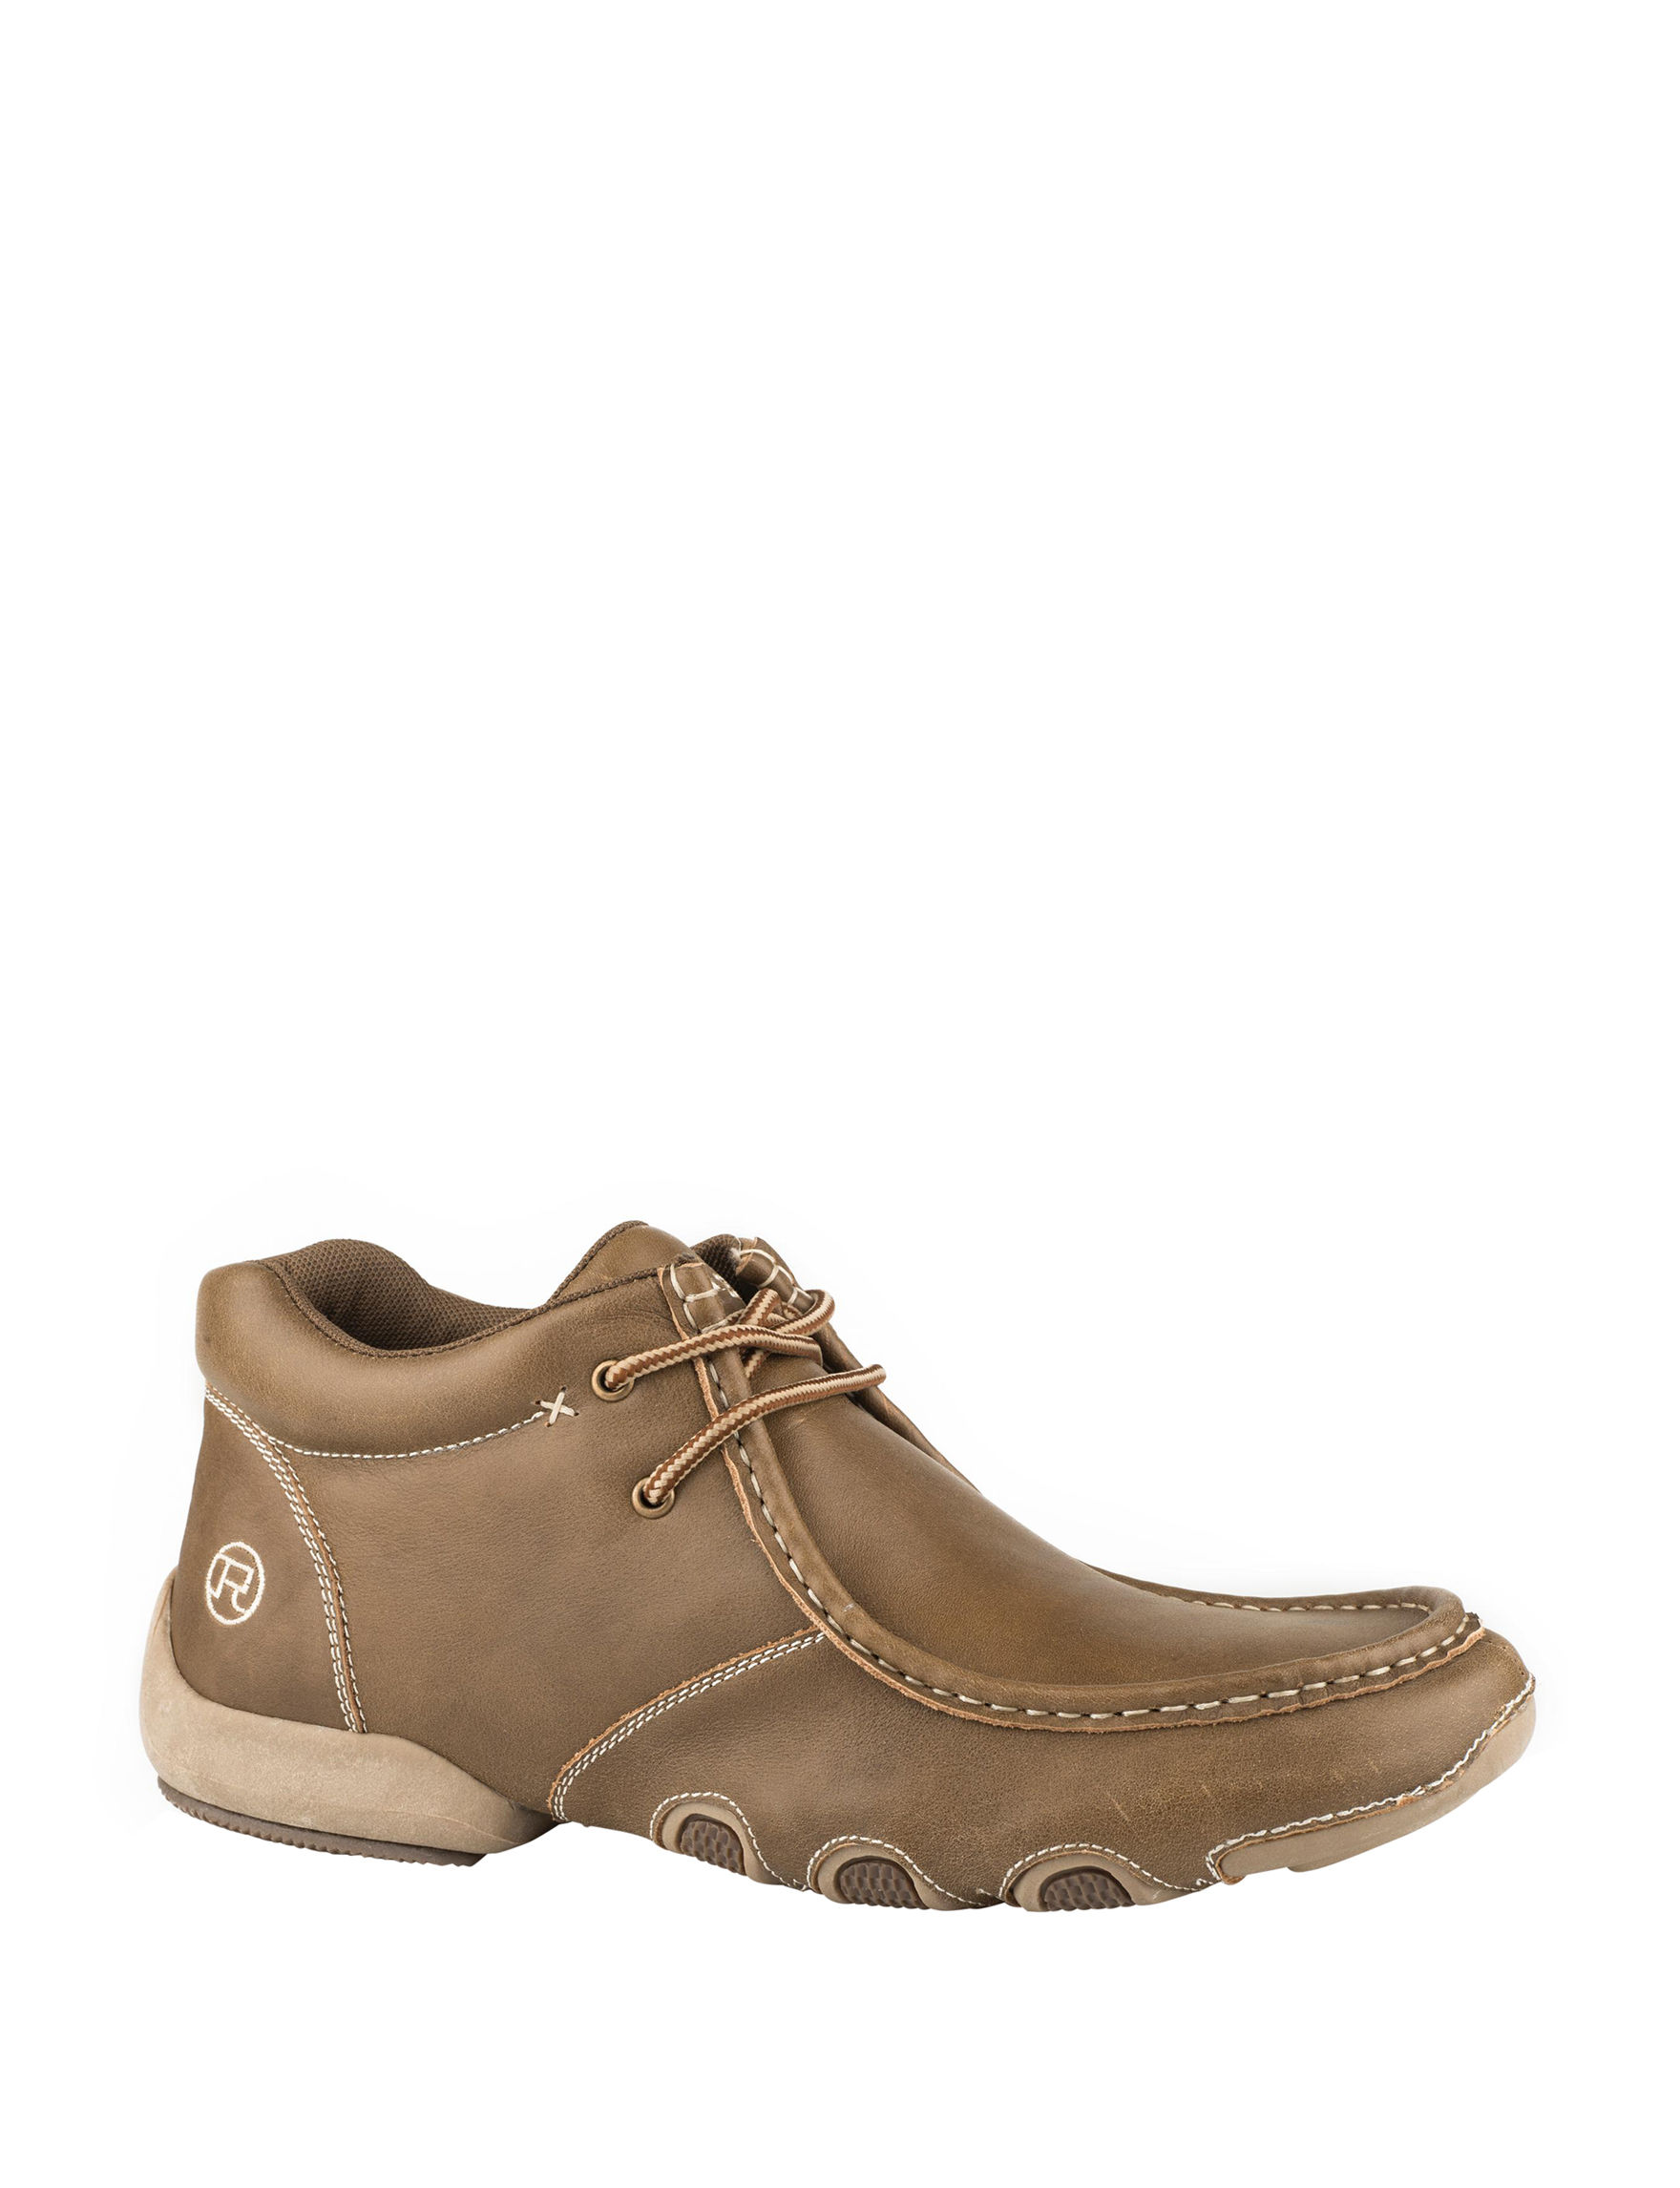 Roper Brown Chukka Boots